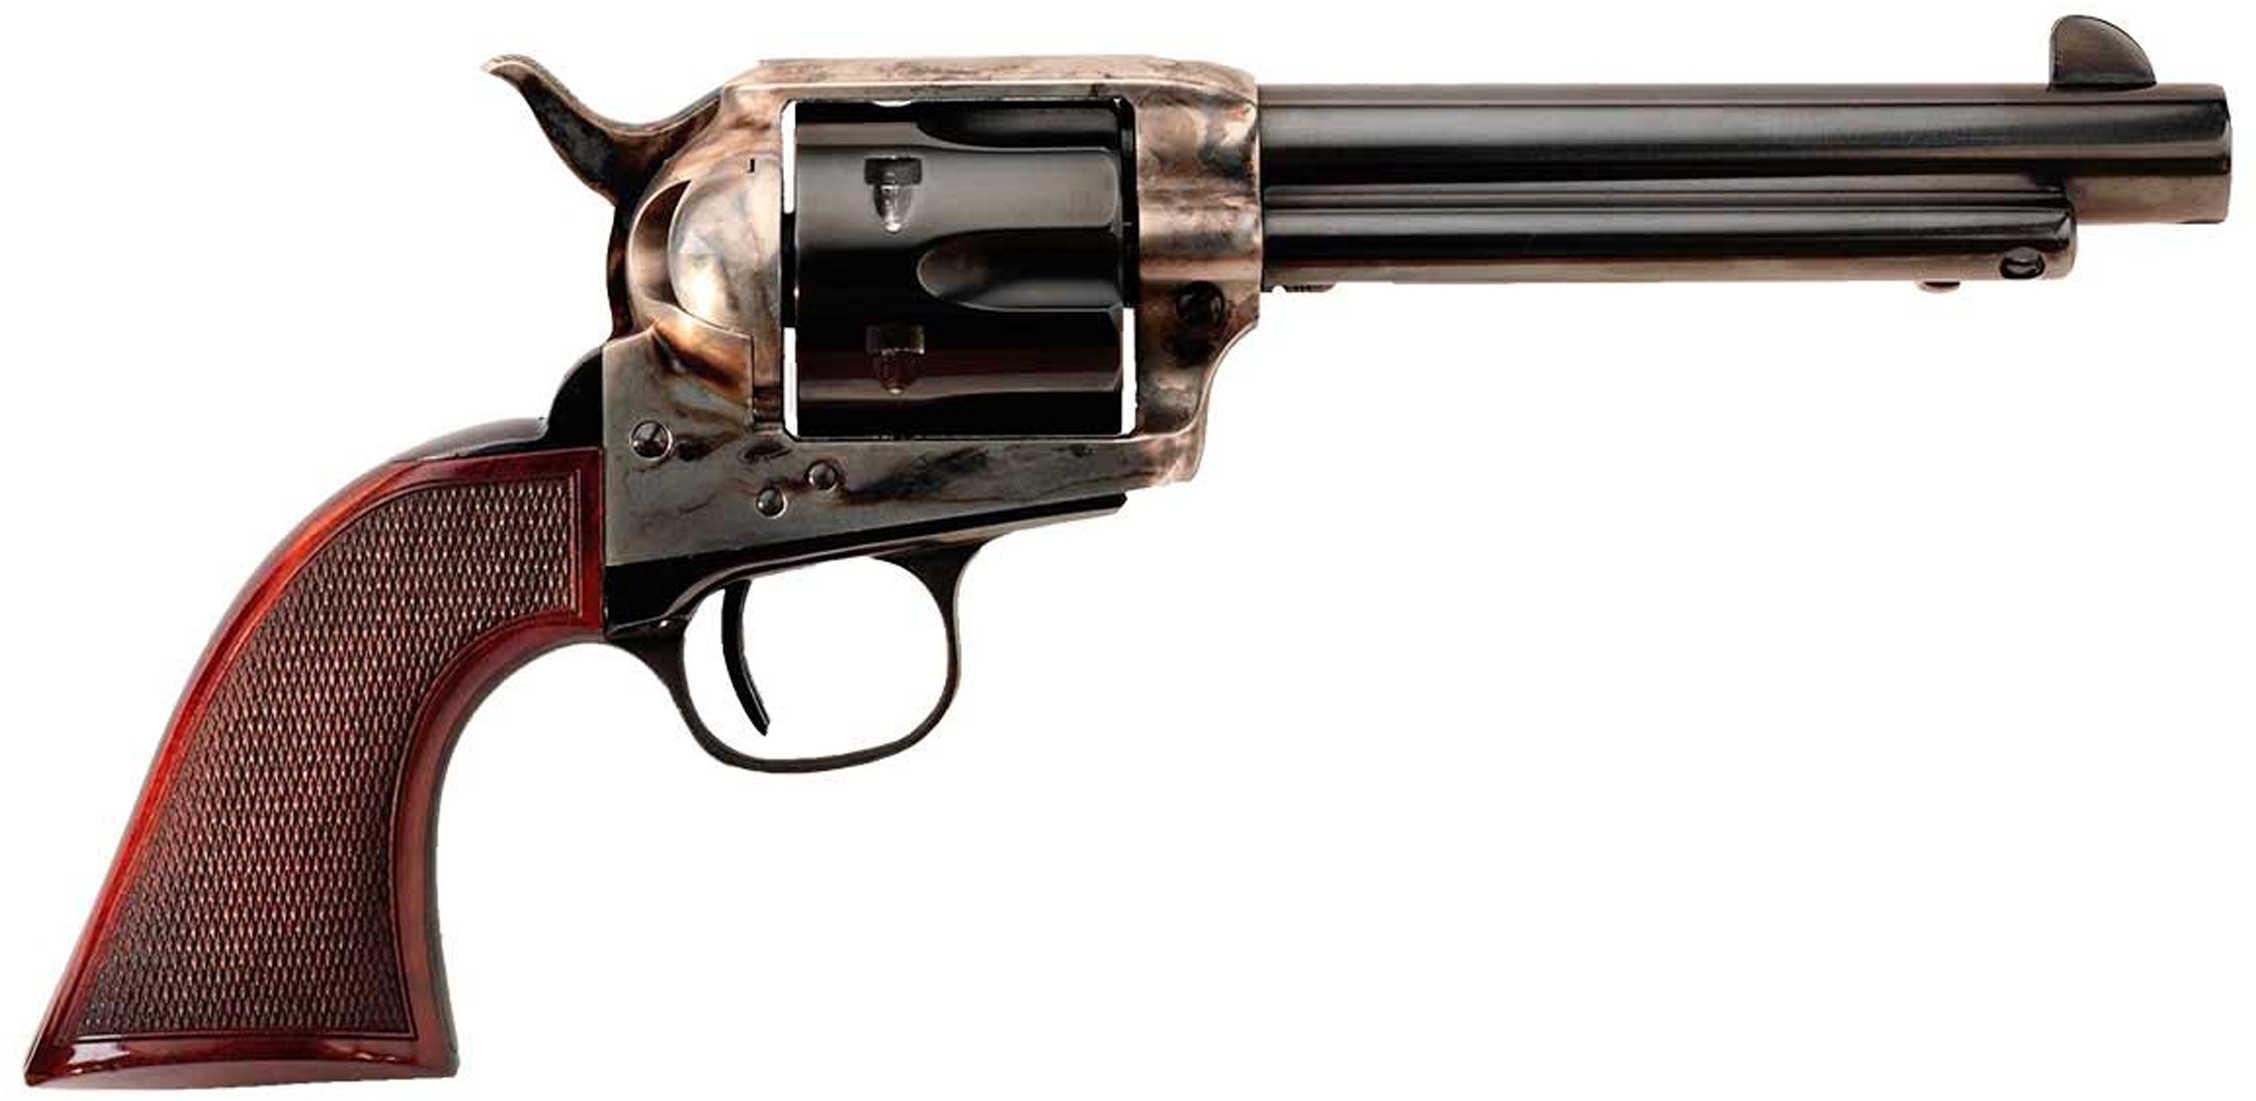 "Taylor's & Company The Smoke Wagon 357 Magnum 4.75"" Barrel 6 Round Single Action Case Hardened Revolver 4107"